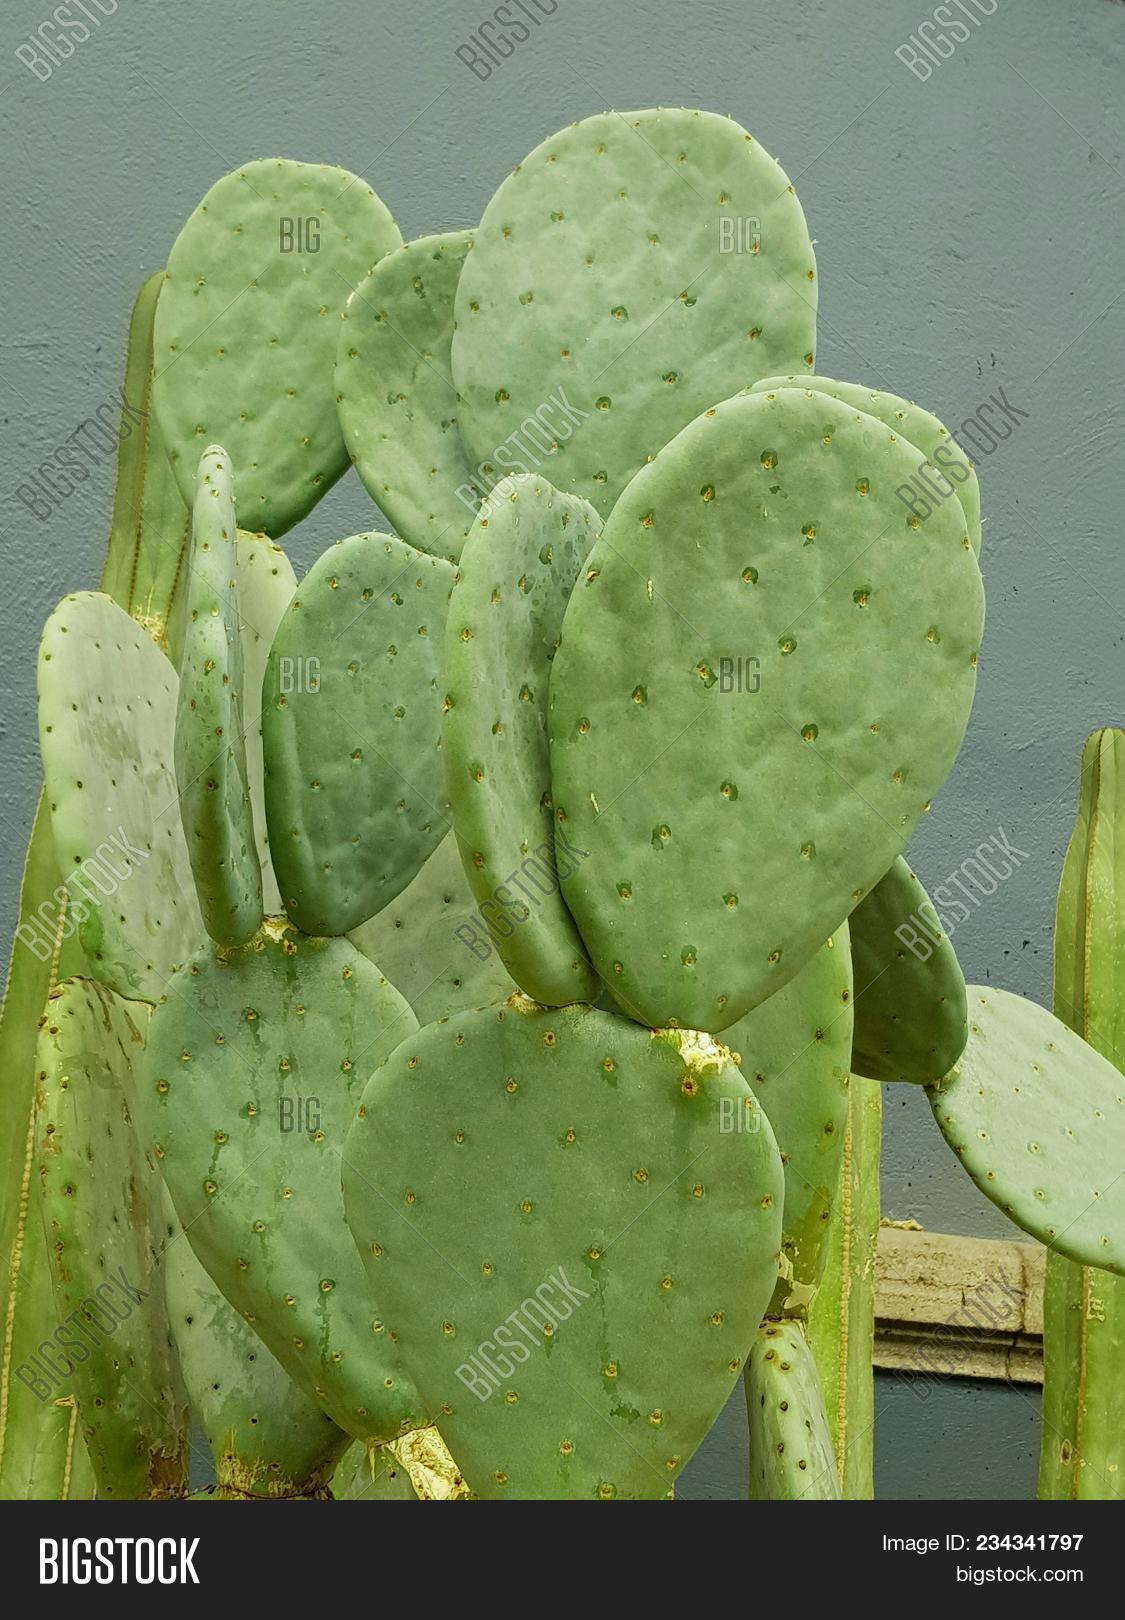 Prickly Pear Cactus, Image & Photo (Free Trial) | Bigstock